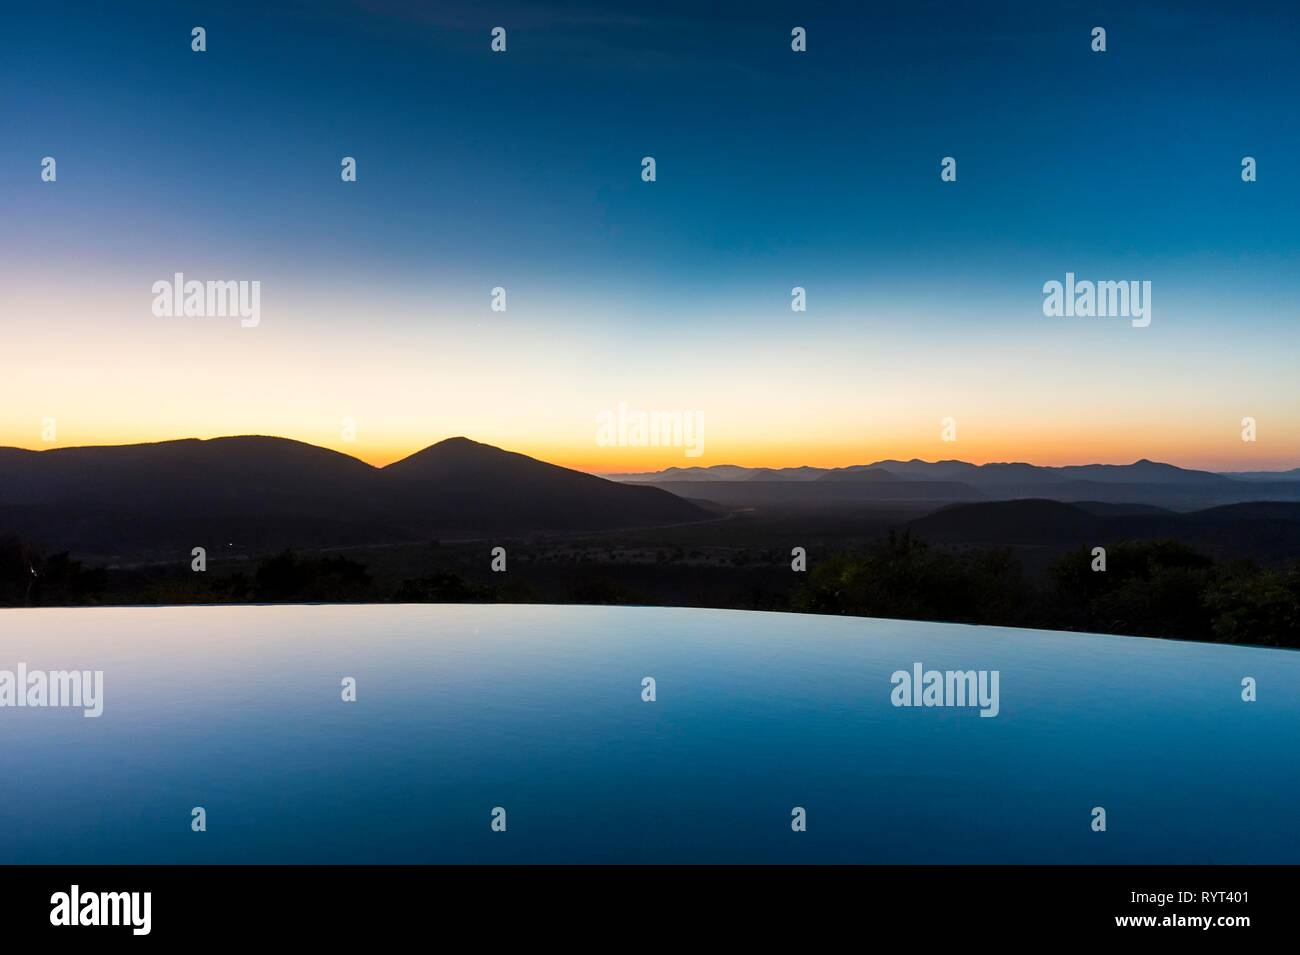 Swimmingpool over beautiful outlook with mountain at sunset, Ovapu, Kaokoland, Namibia - Stock Image